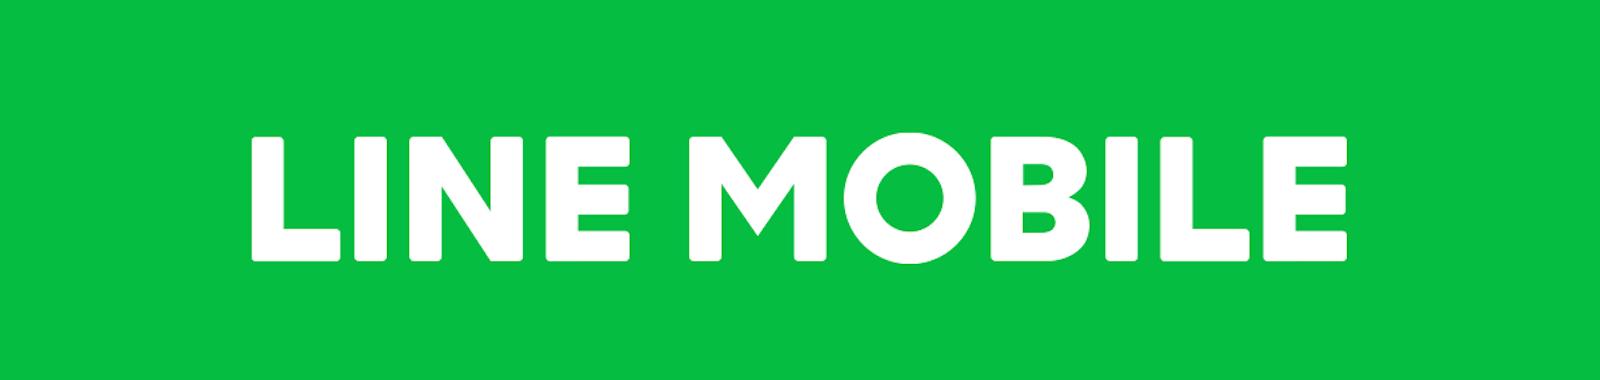 line mobile2